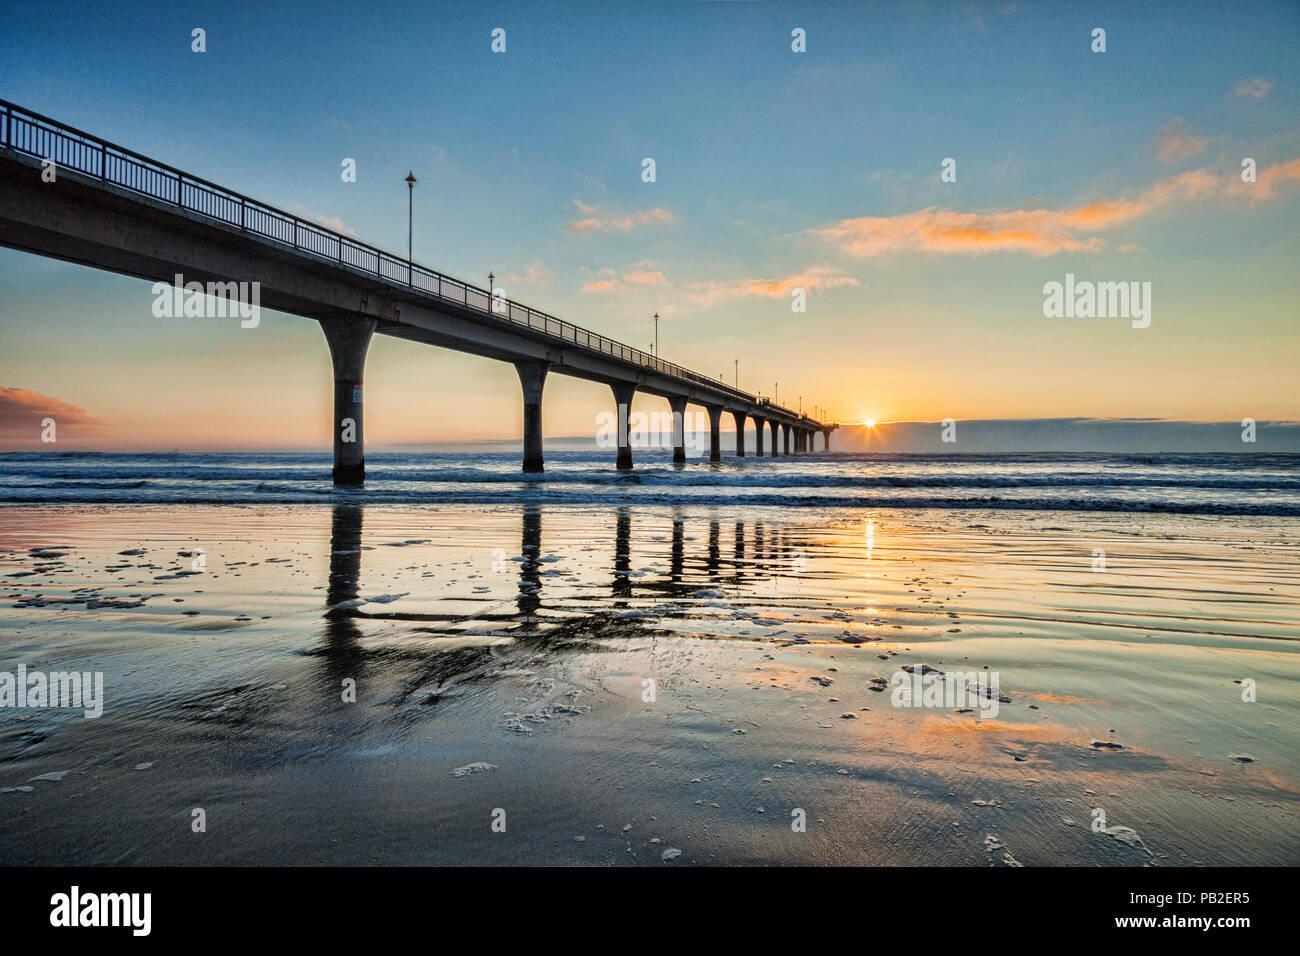 Sunrise at New Brighton Pier, Christchurch, New Zealand. - Stock Image